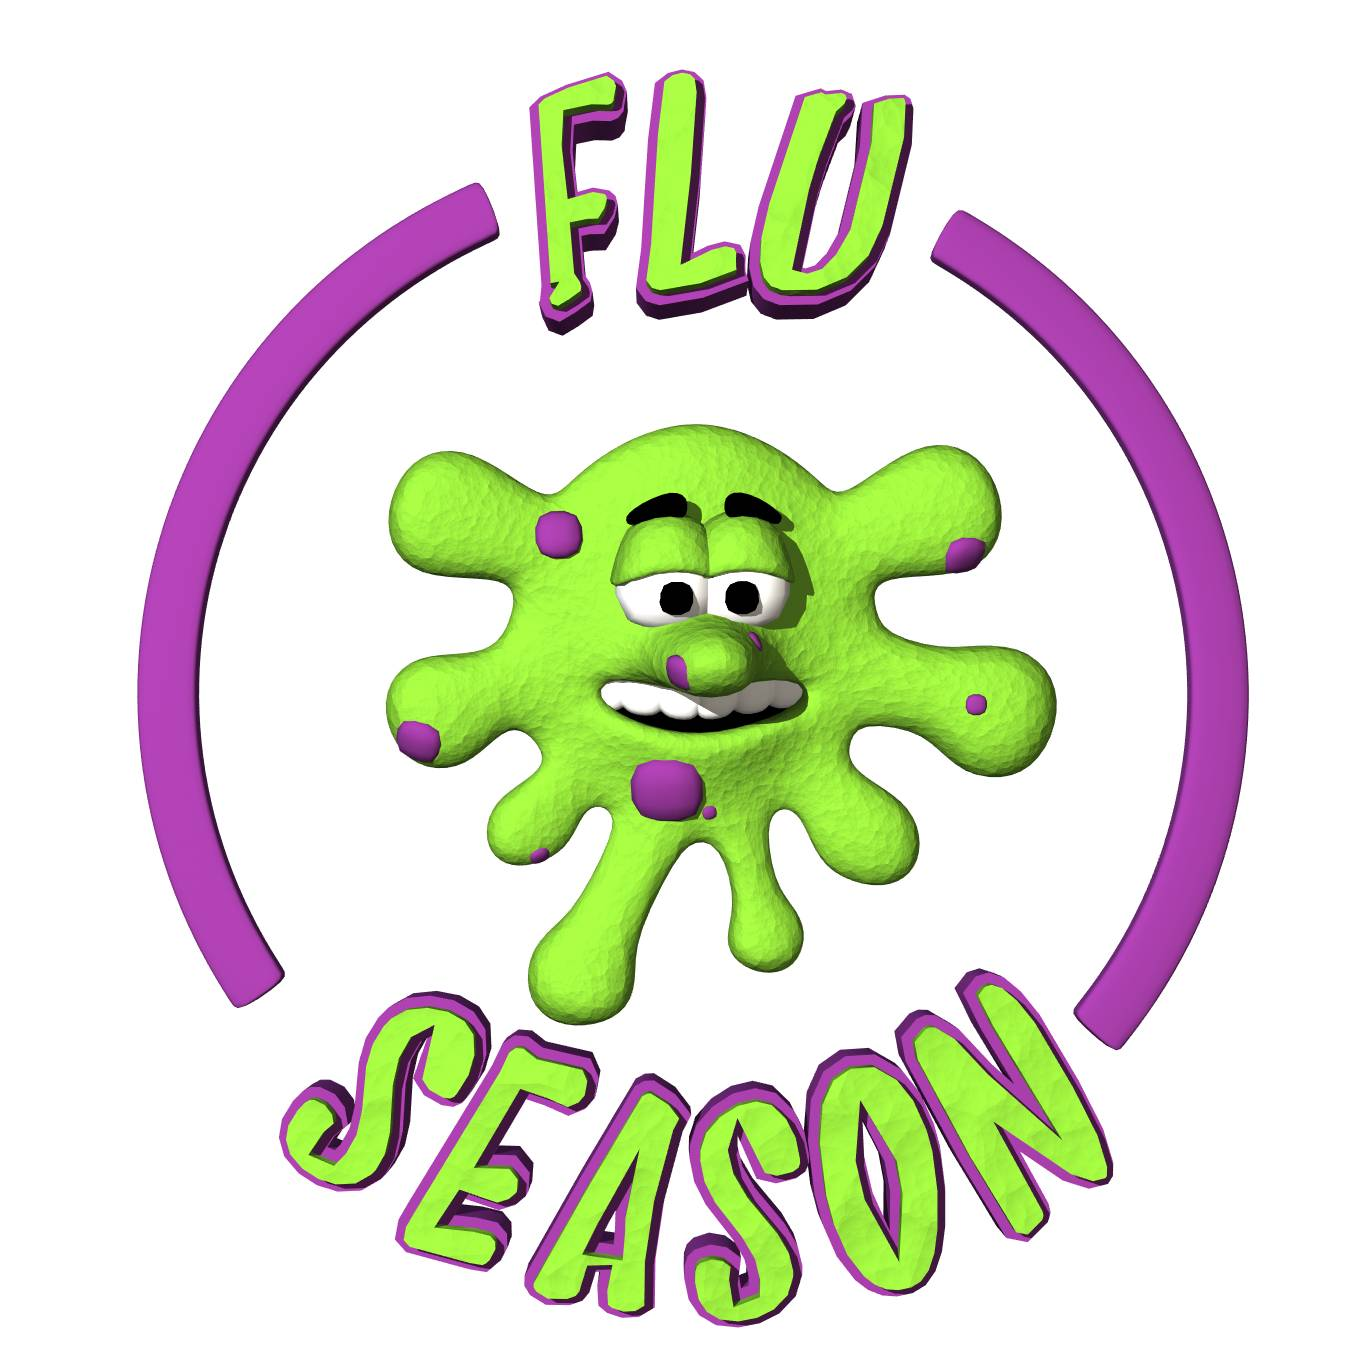 Free download best on. Flu clipart flu virus